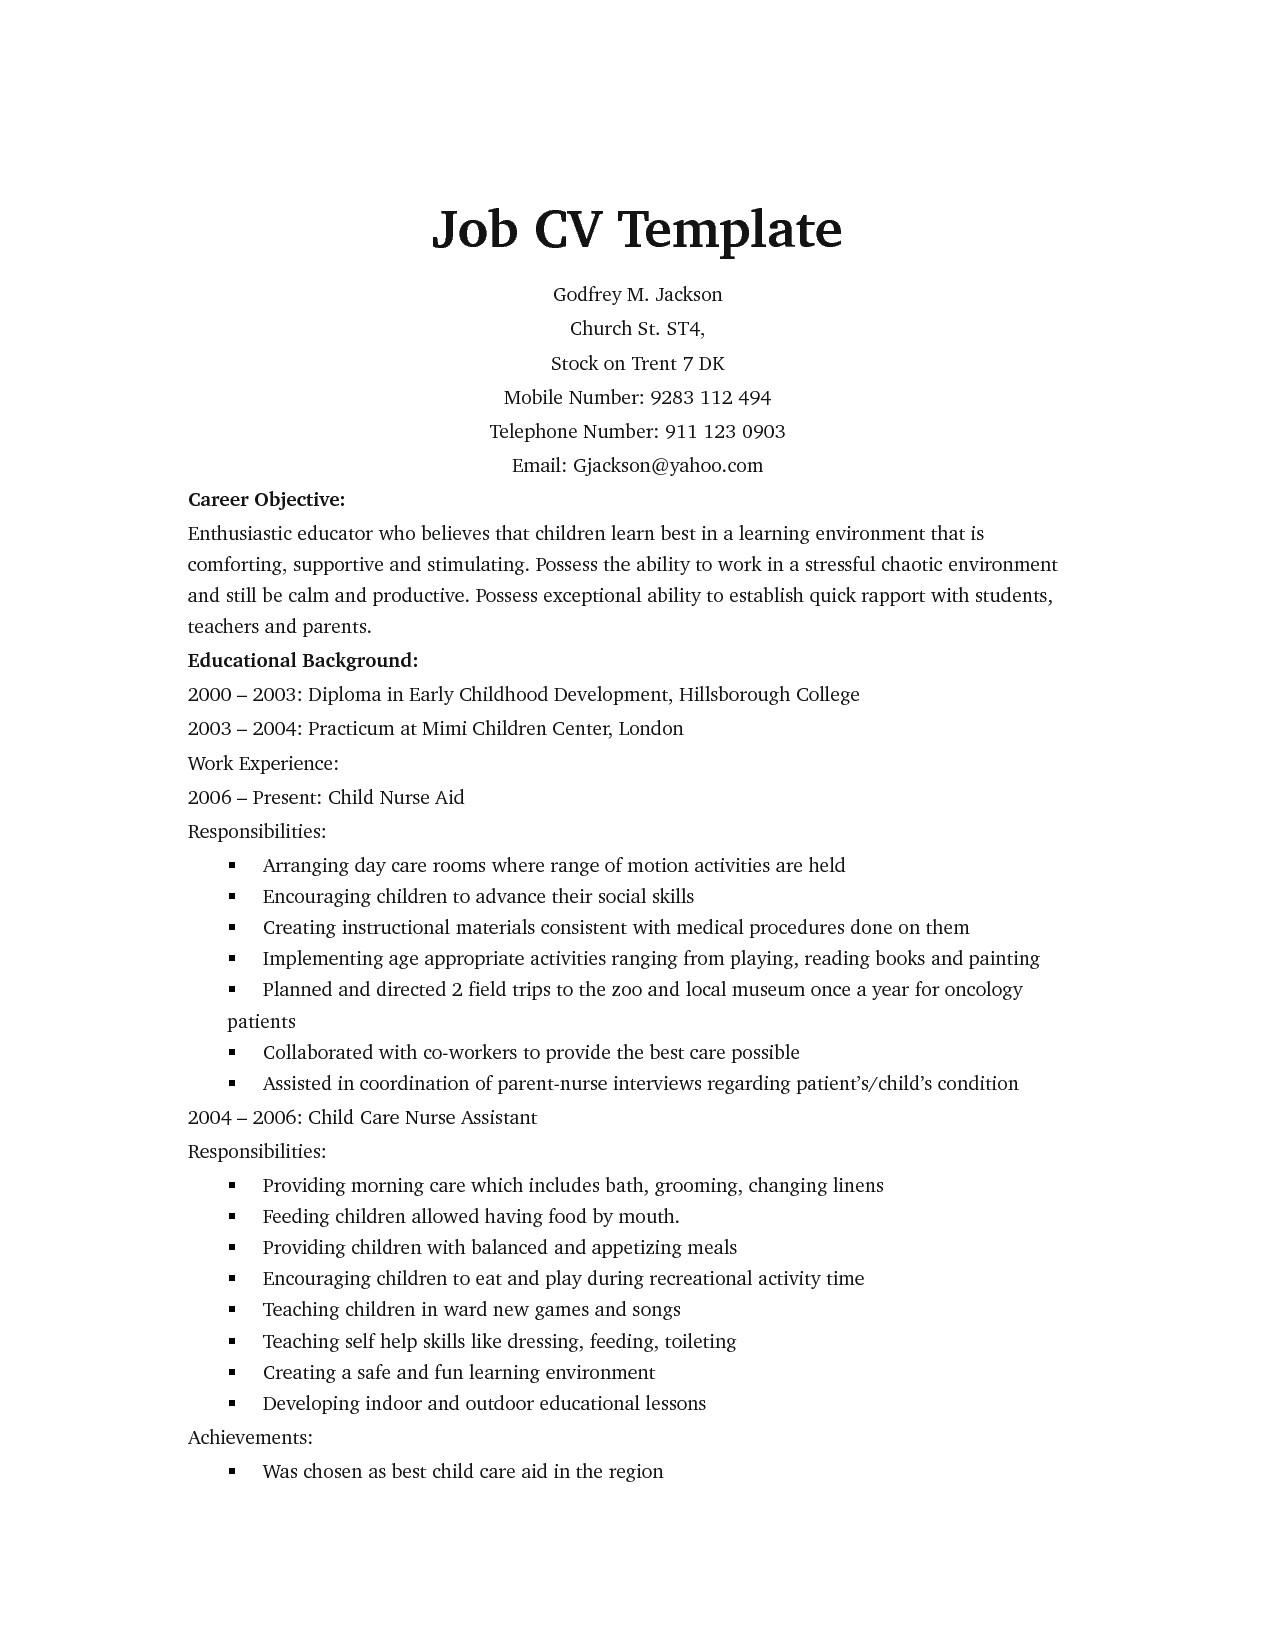 job specific resume templates